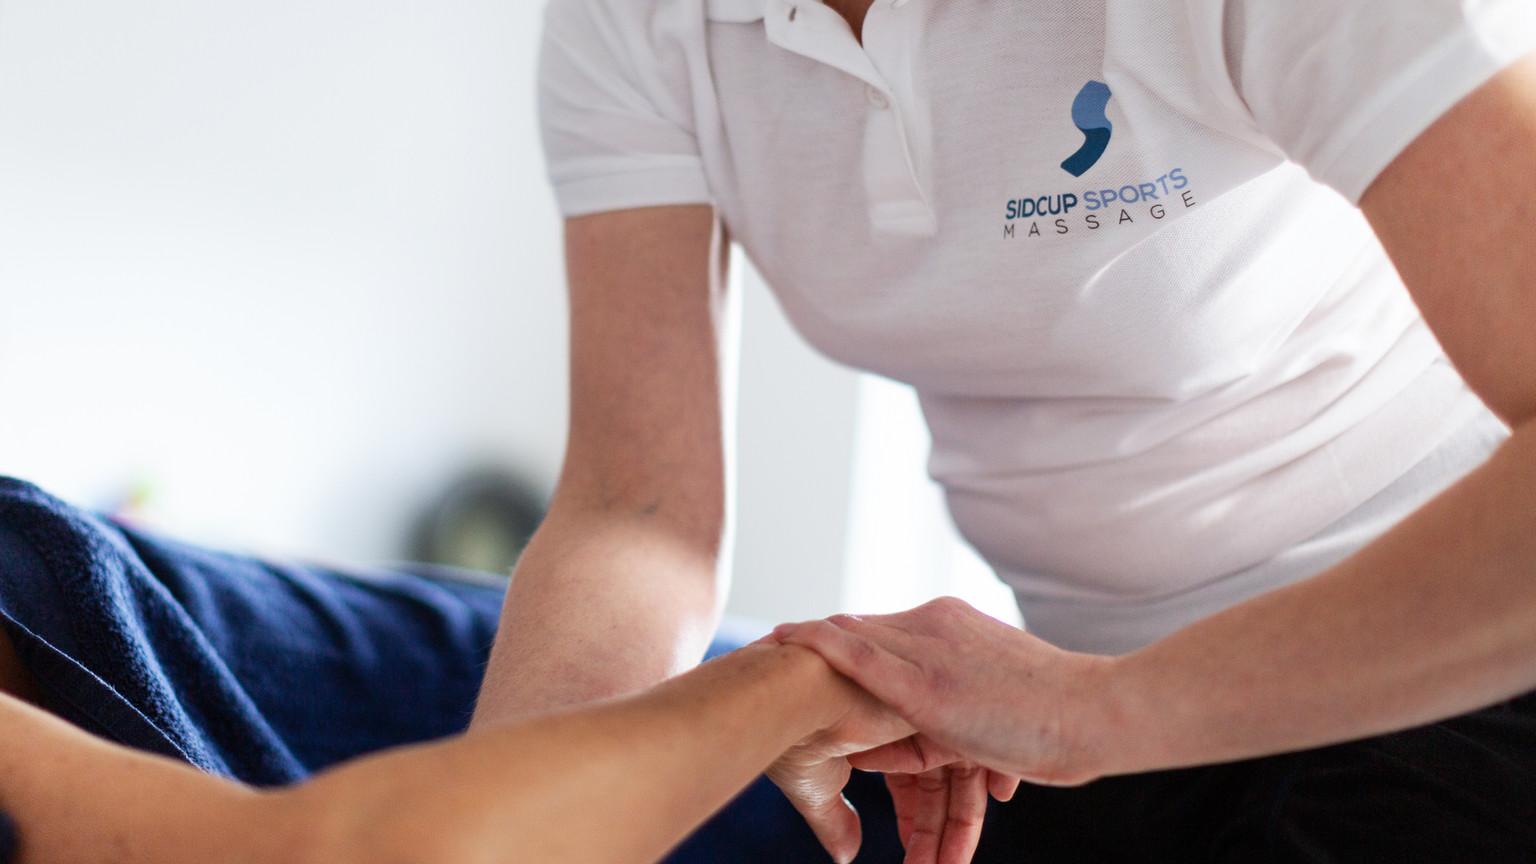 Sidcup Sports Massage